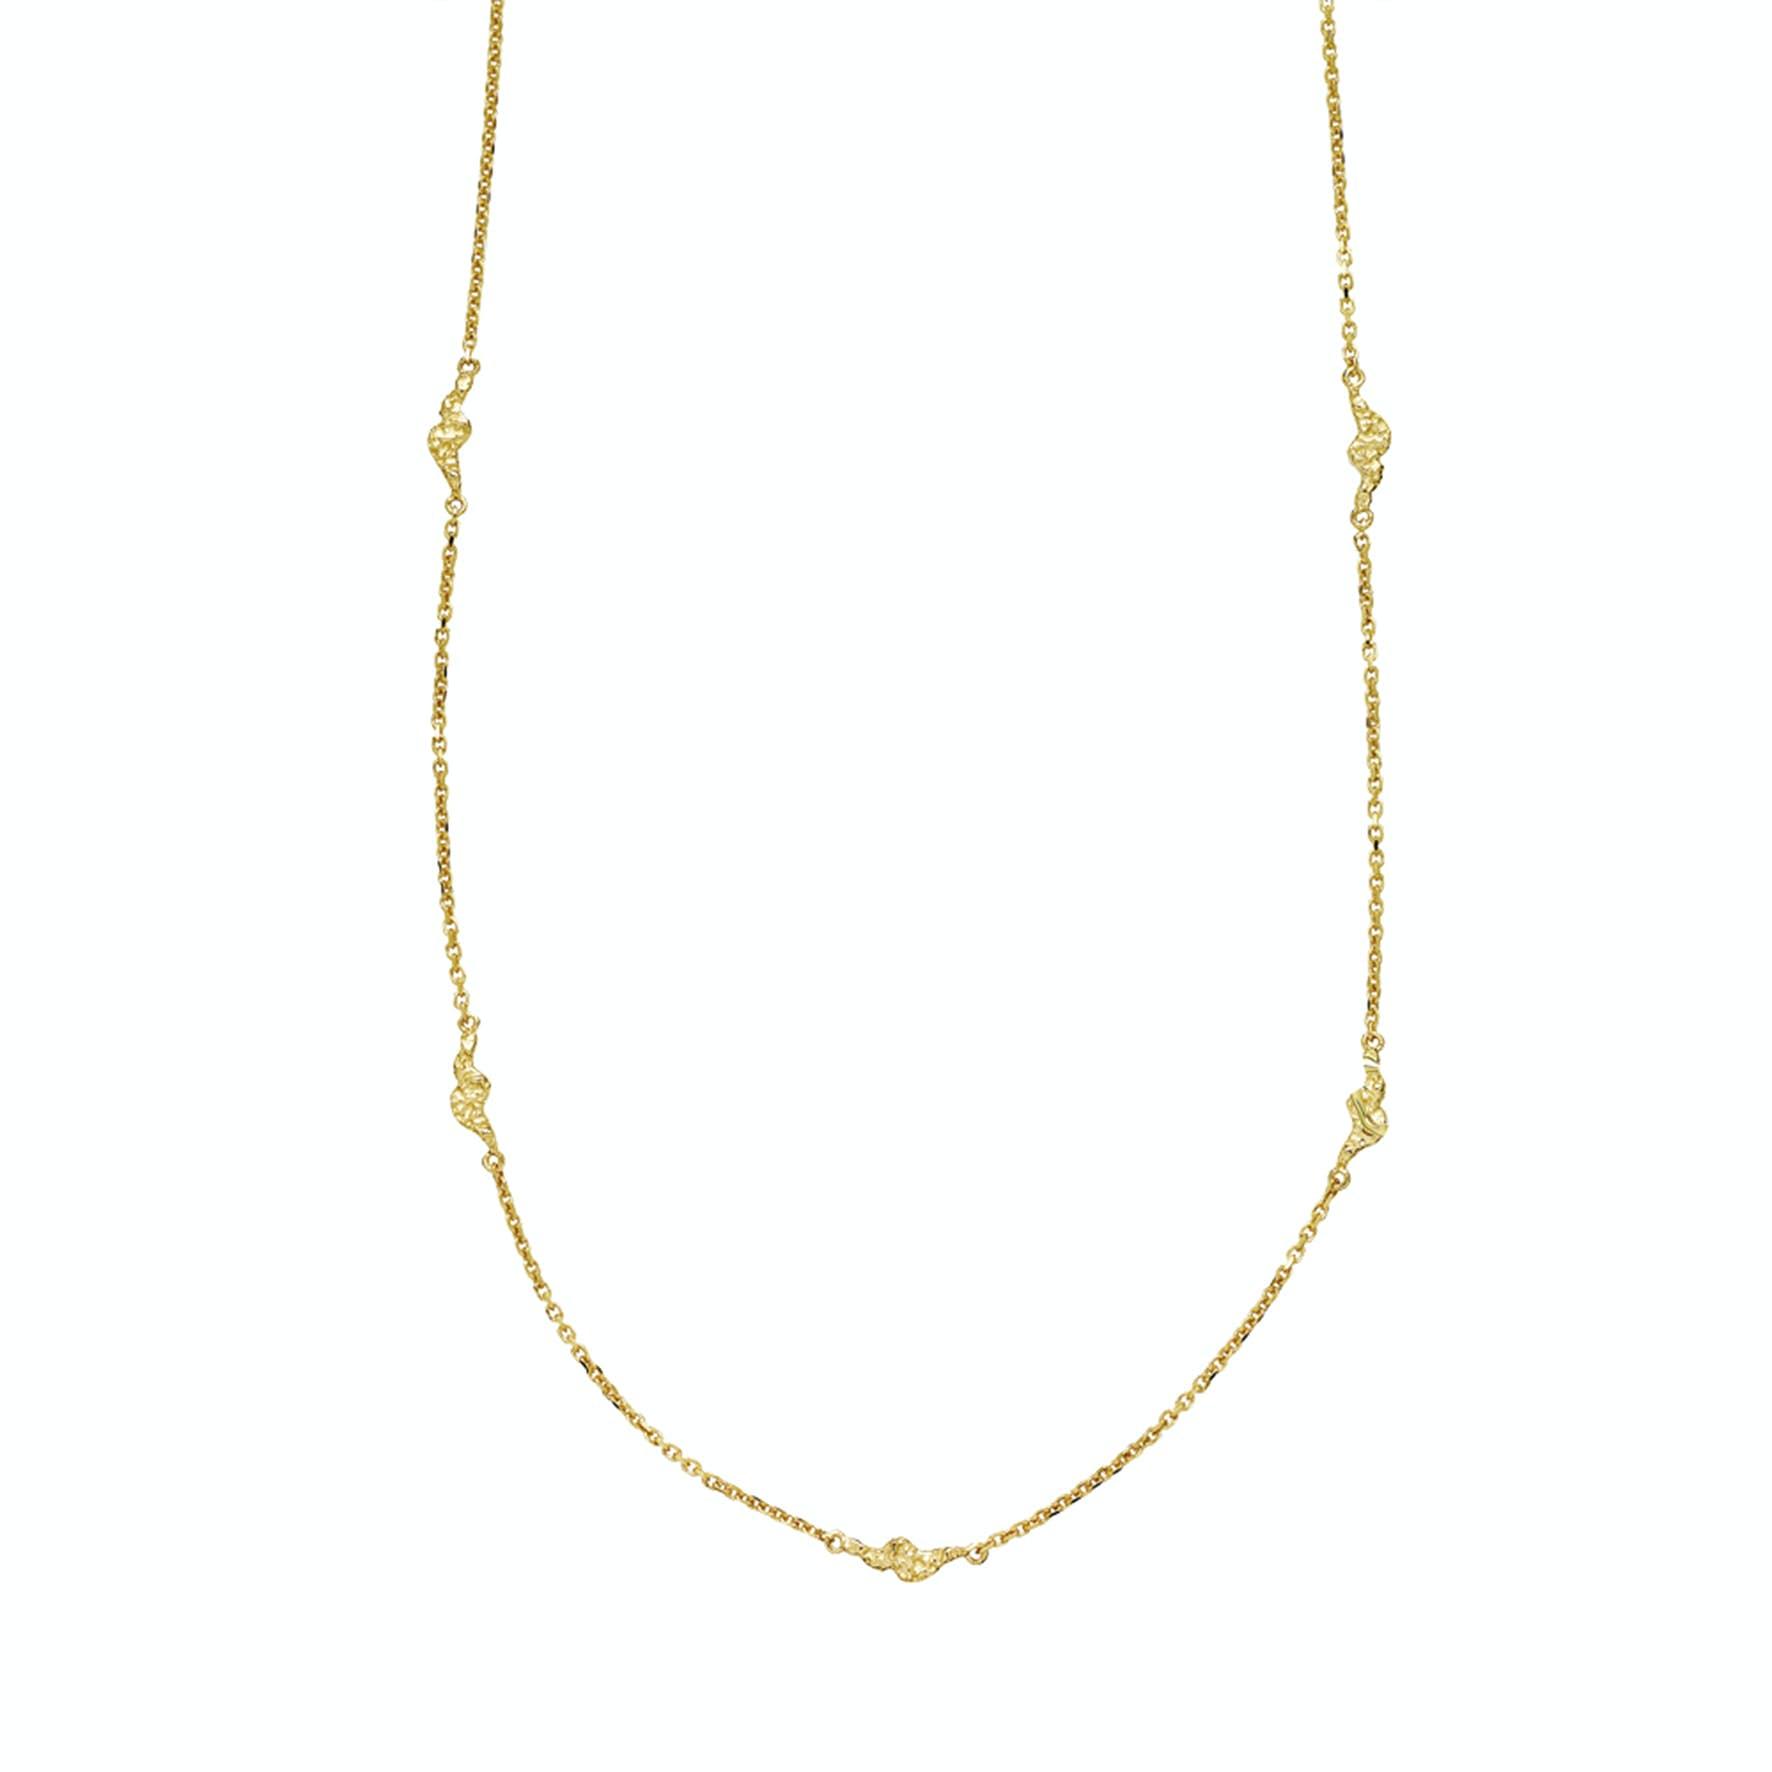 Silke By Sistie Necklace von Sistie in Vergoldet-Silber Sterling 925|Blank